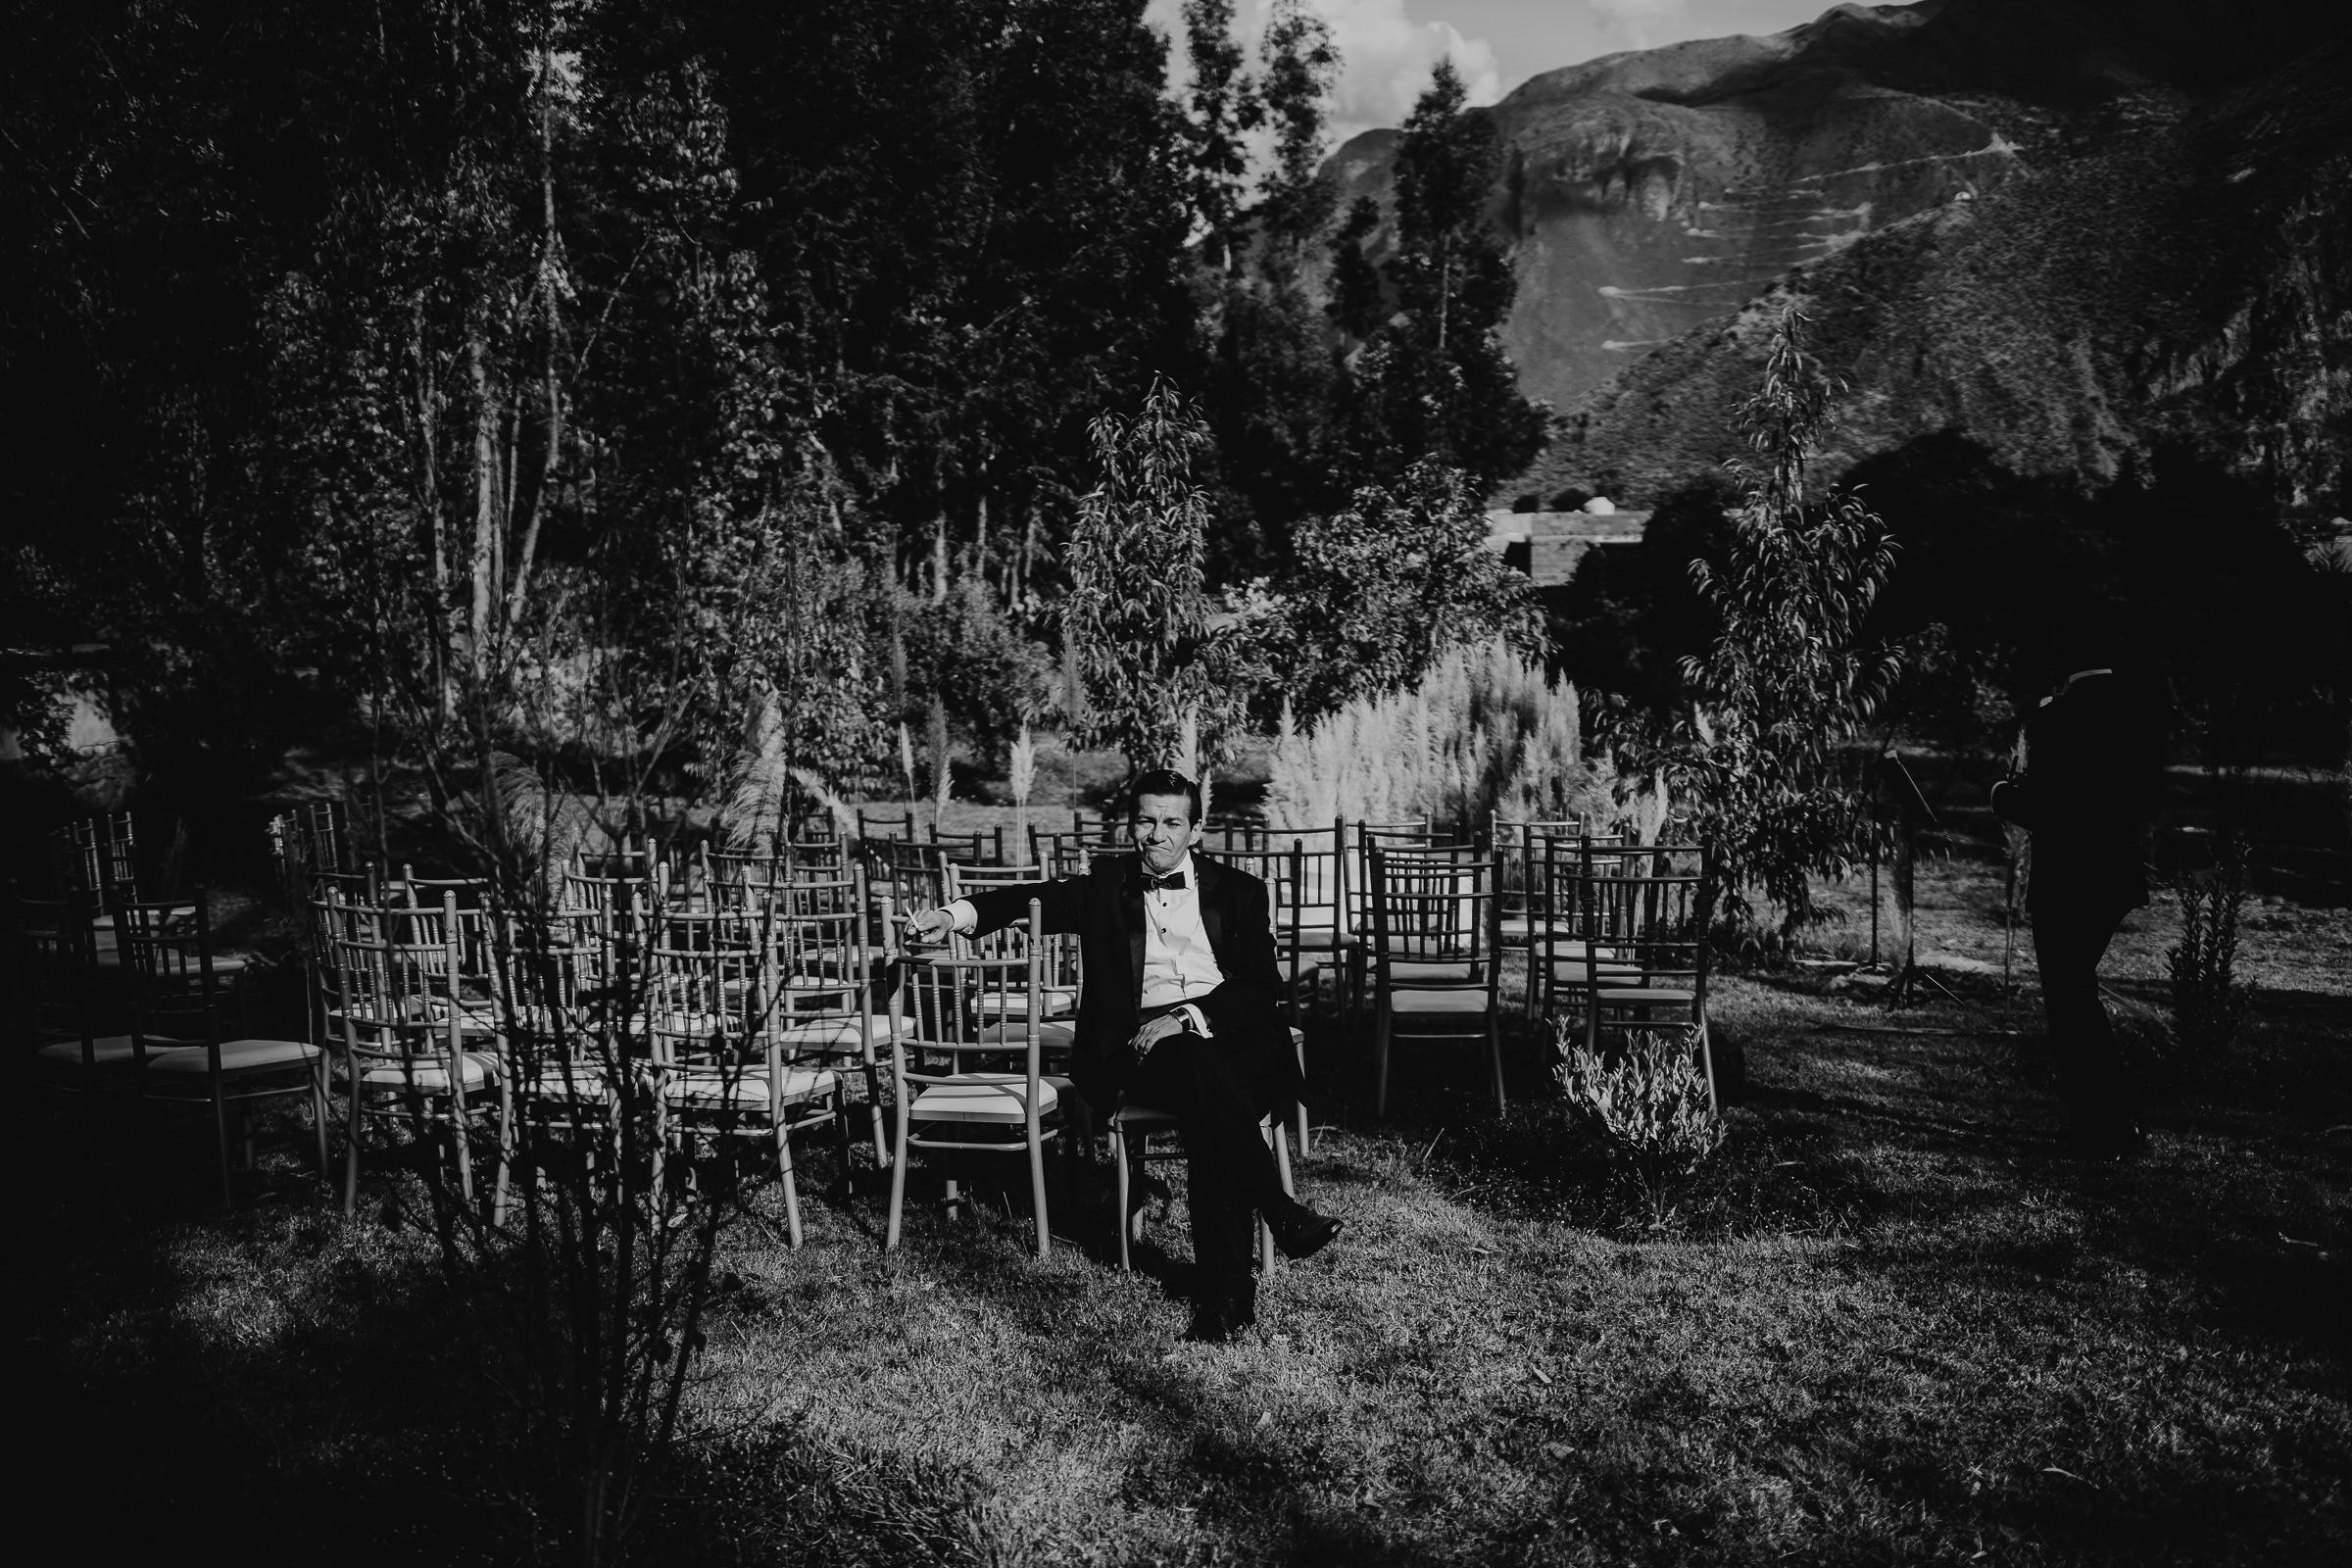 man sitting alone at a wedding ceremony set up